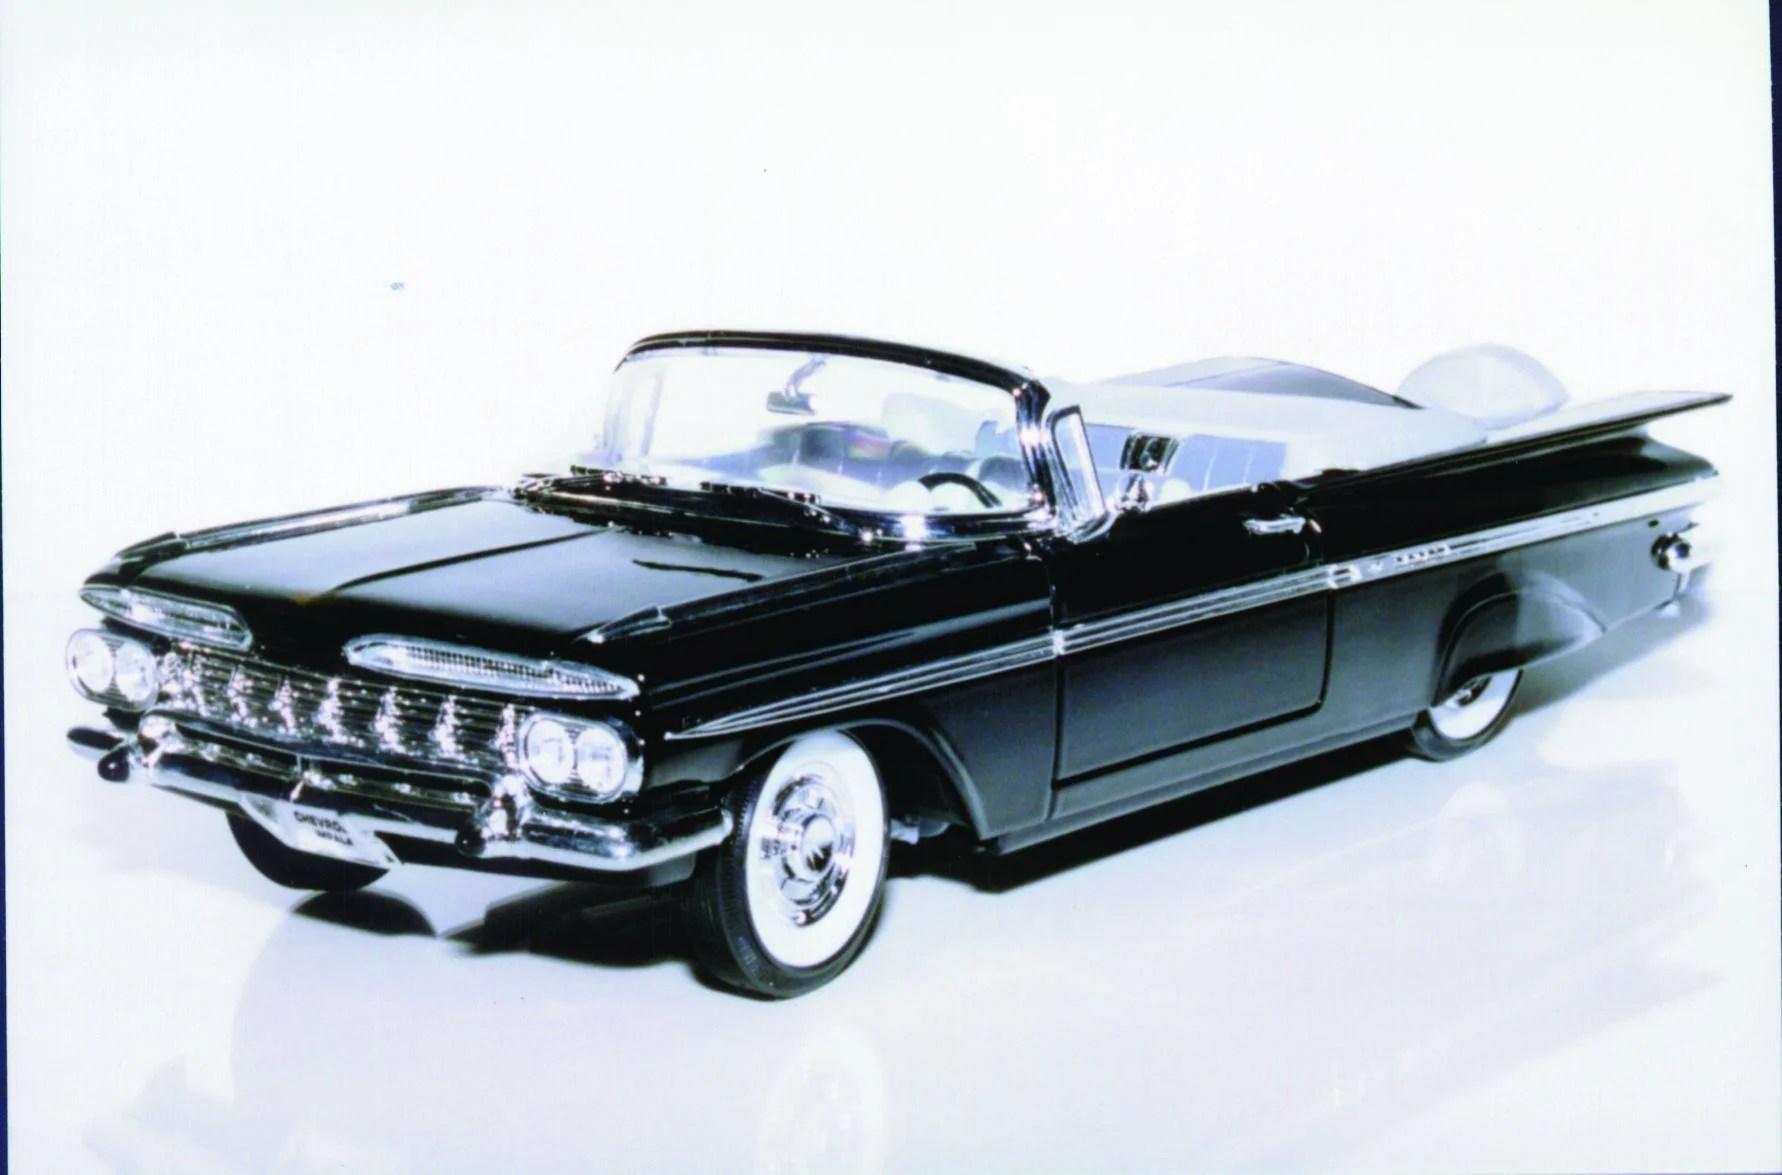 small resolution of 1 18 yatming chevy impala 59 convertible